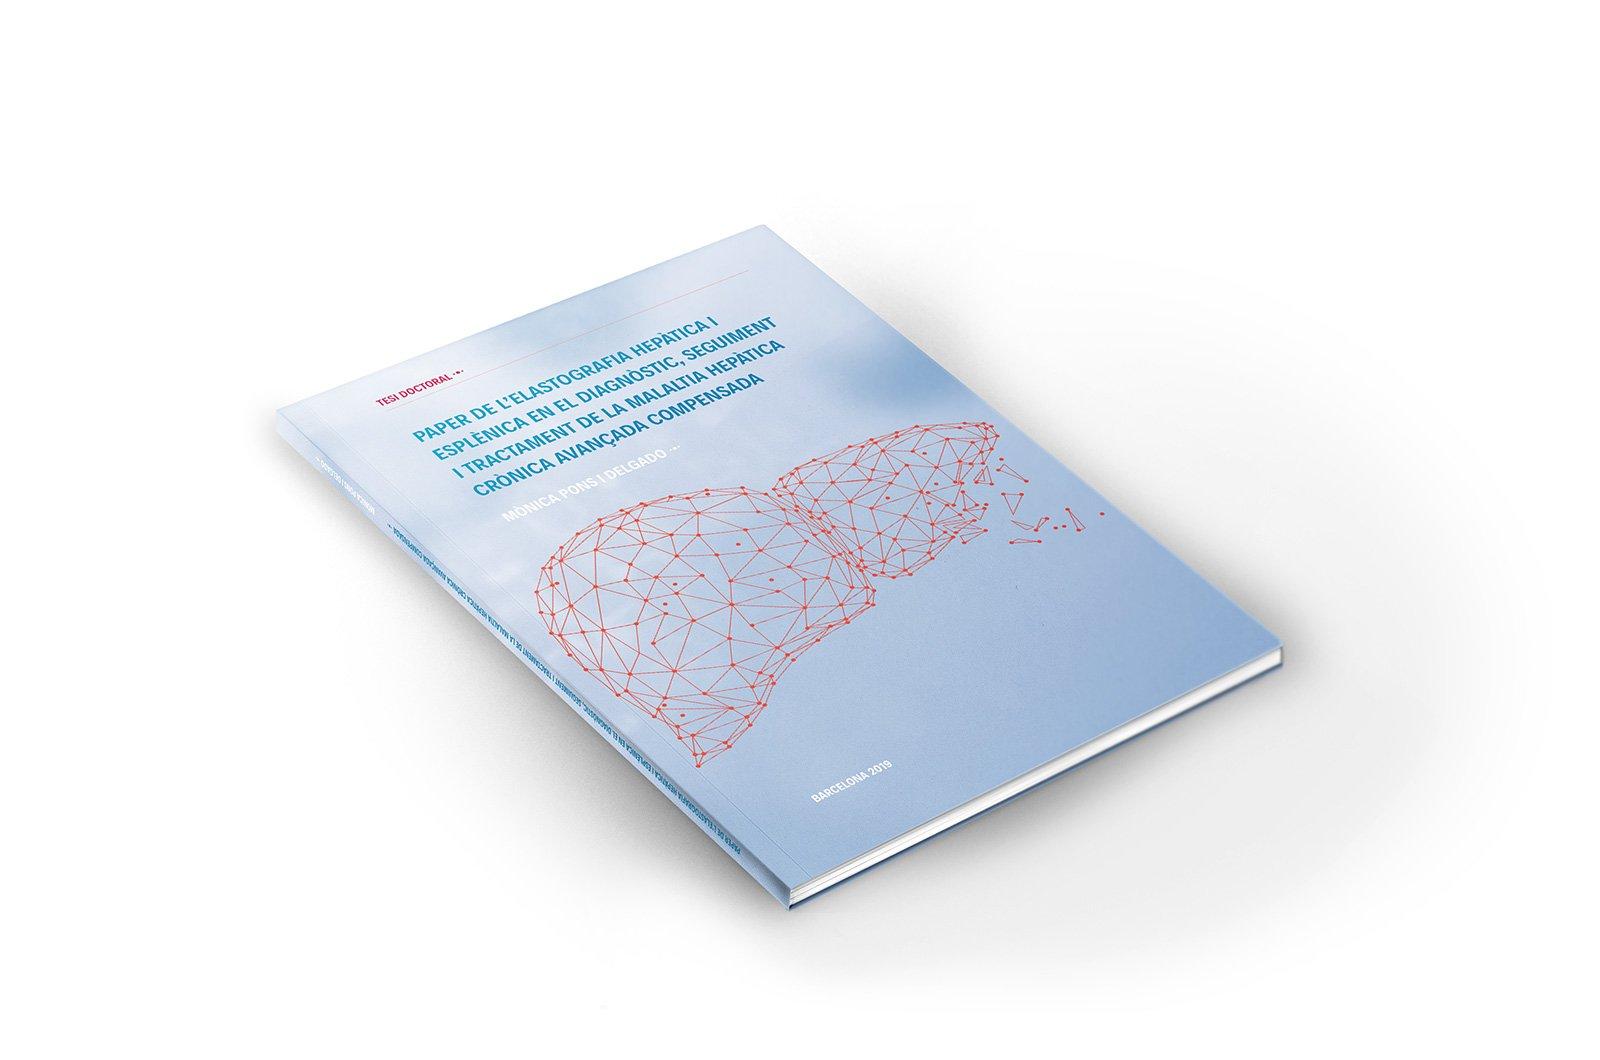 portada tesi doctoral de M. Pons